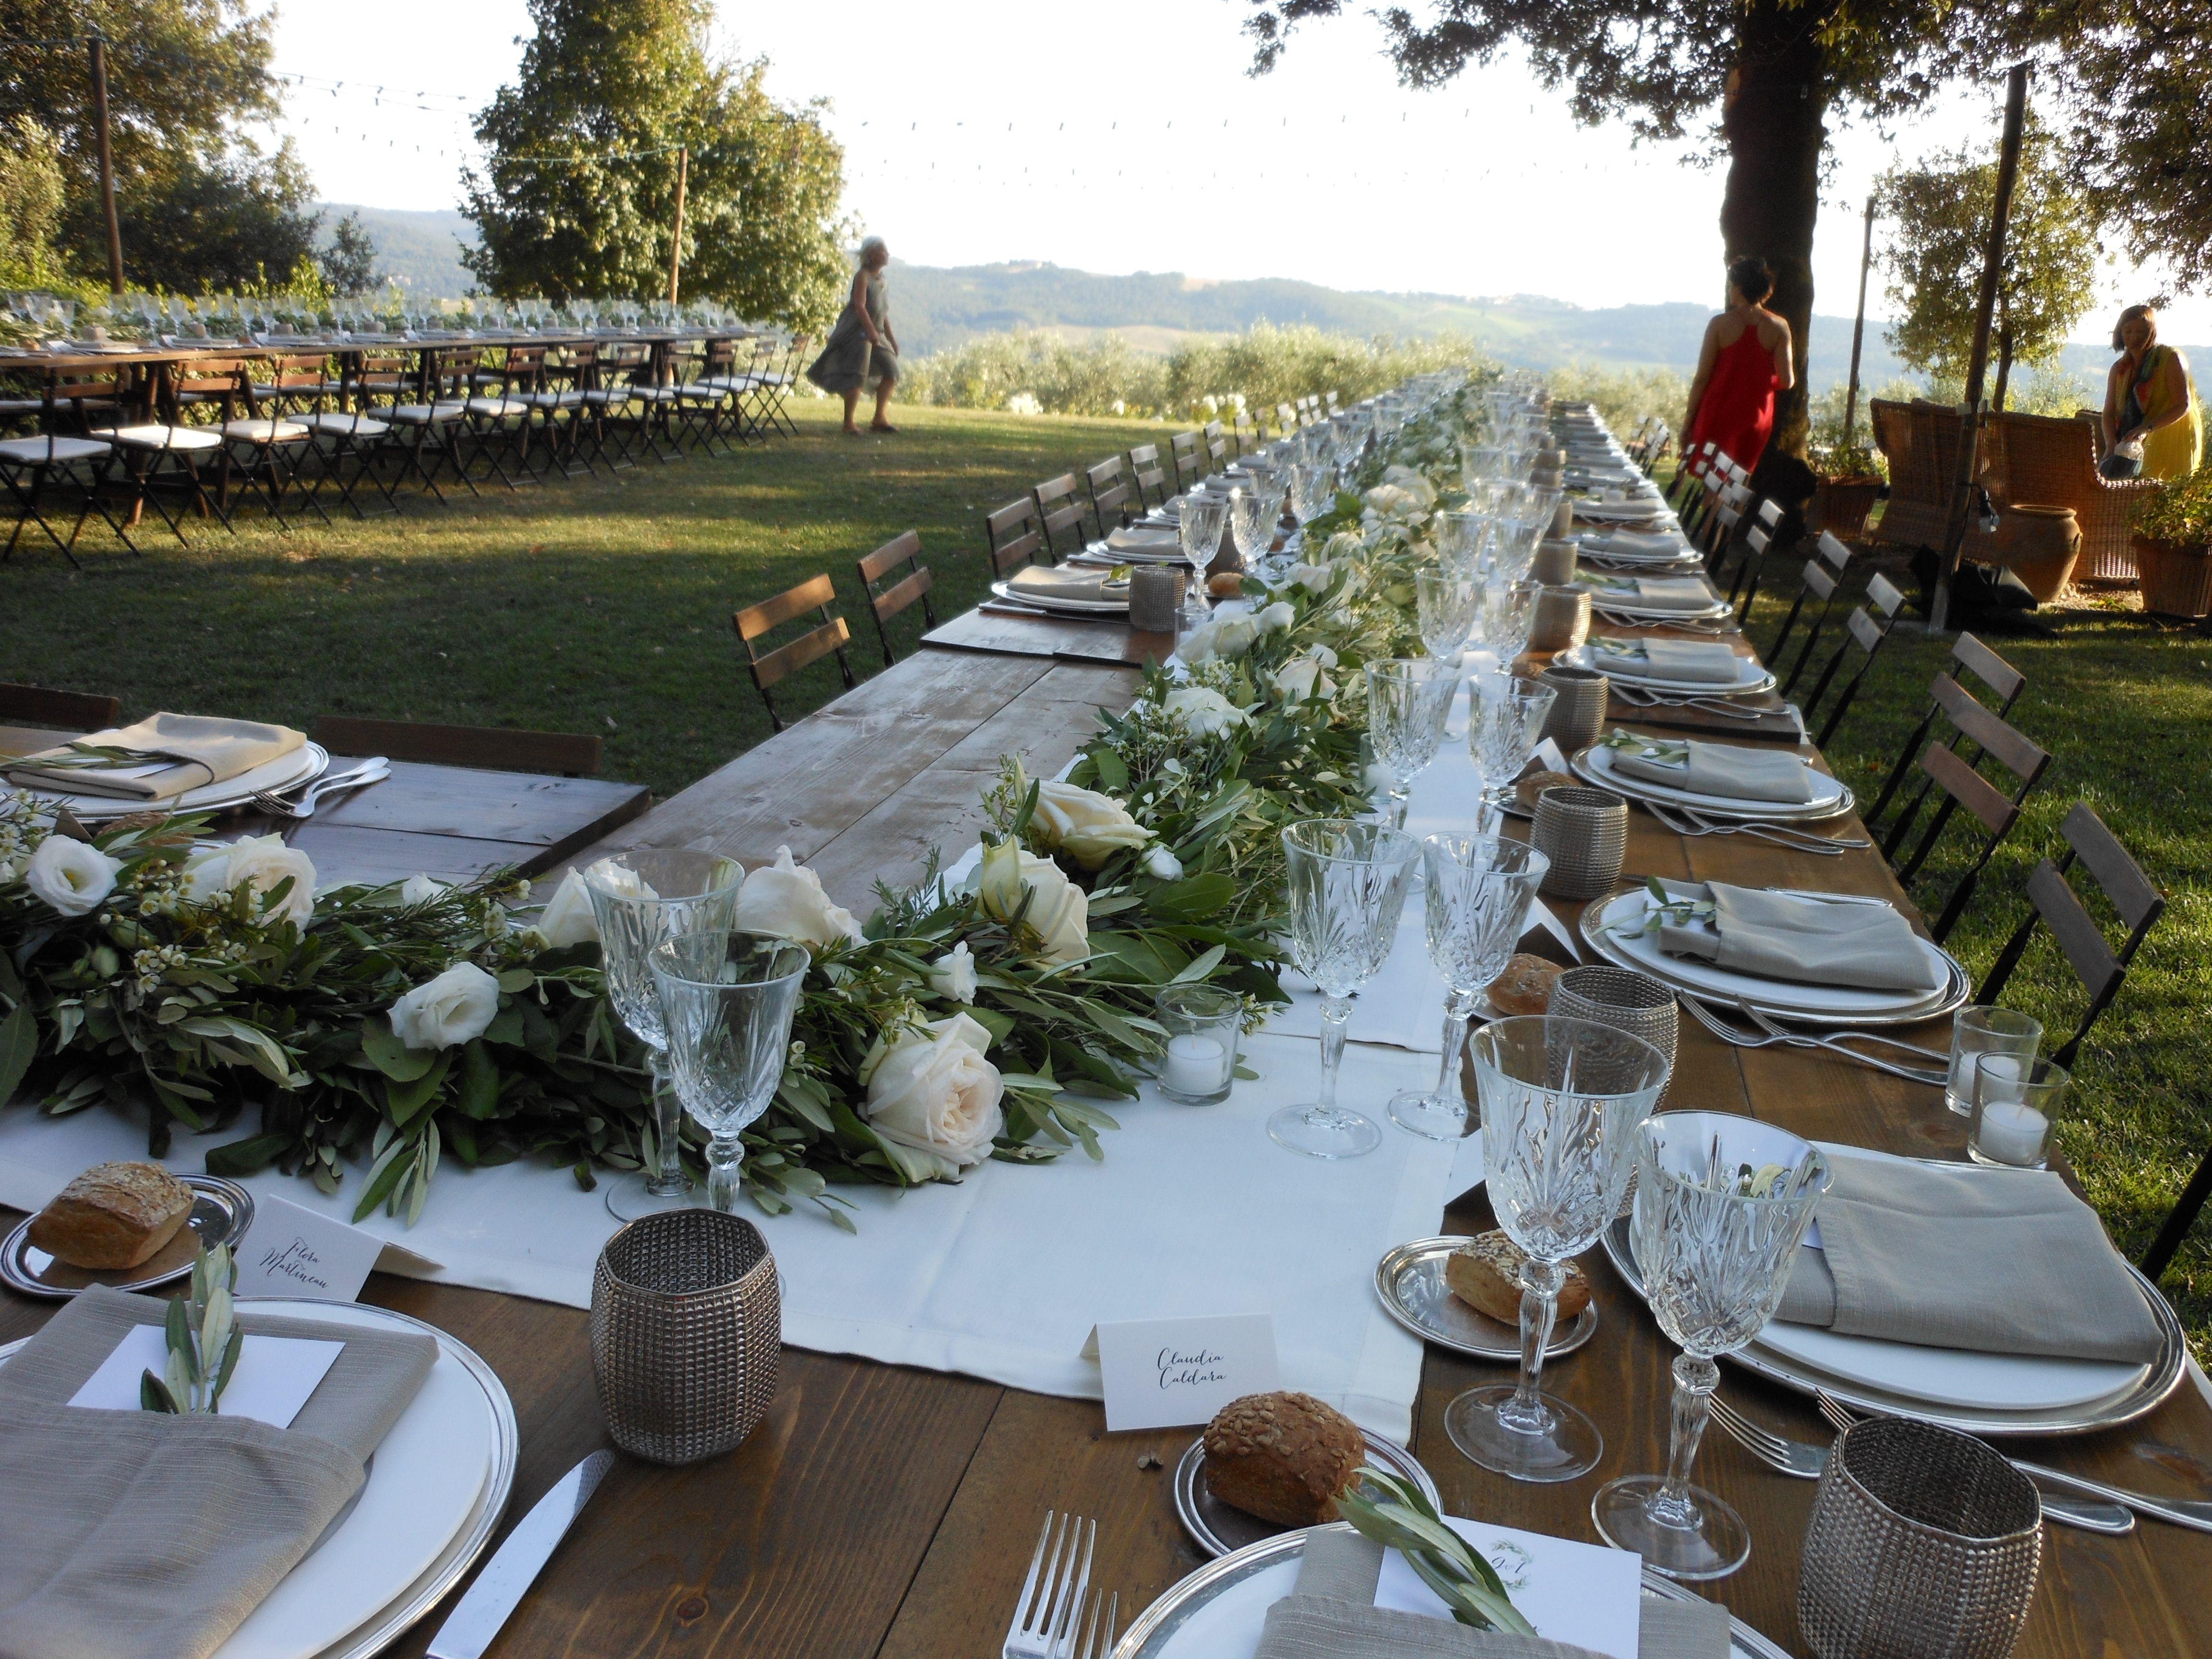 Tavolo Imperiale ~ Country chic wedding tavolo imperiale wedding ristorante tonino